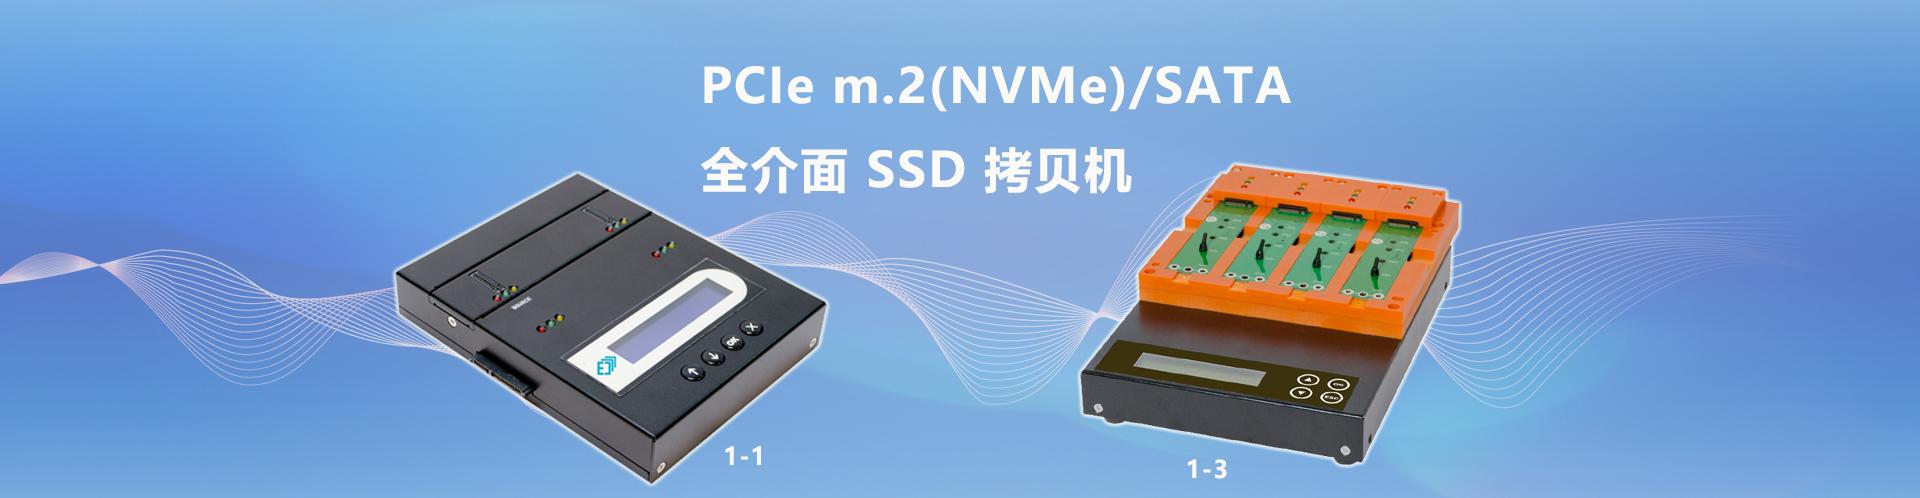 PCIE SSD硬盘拷贝机